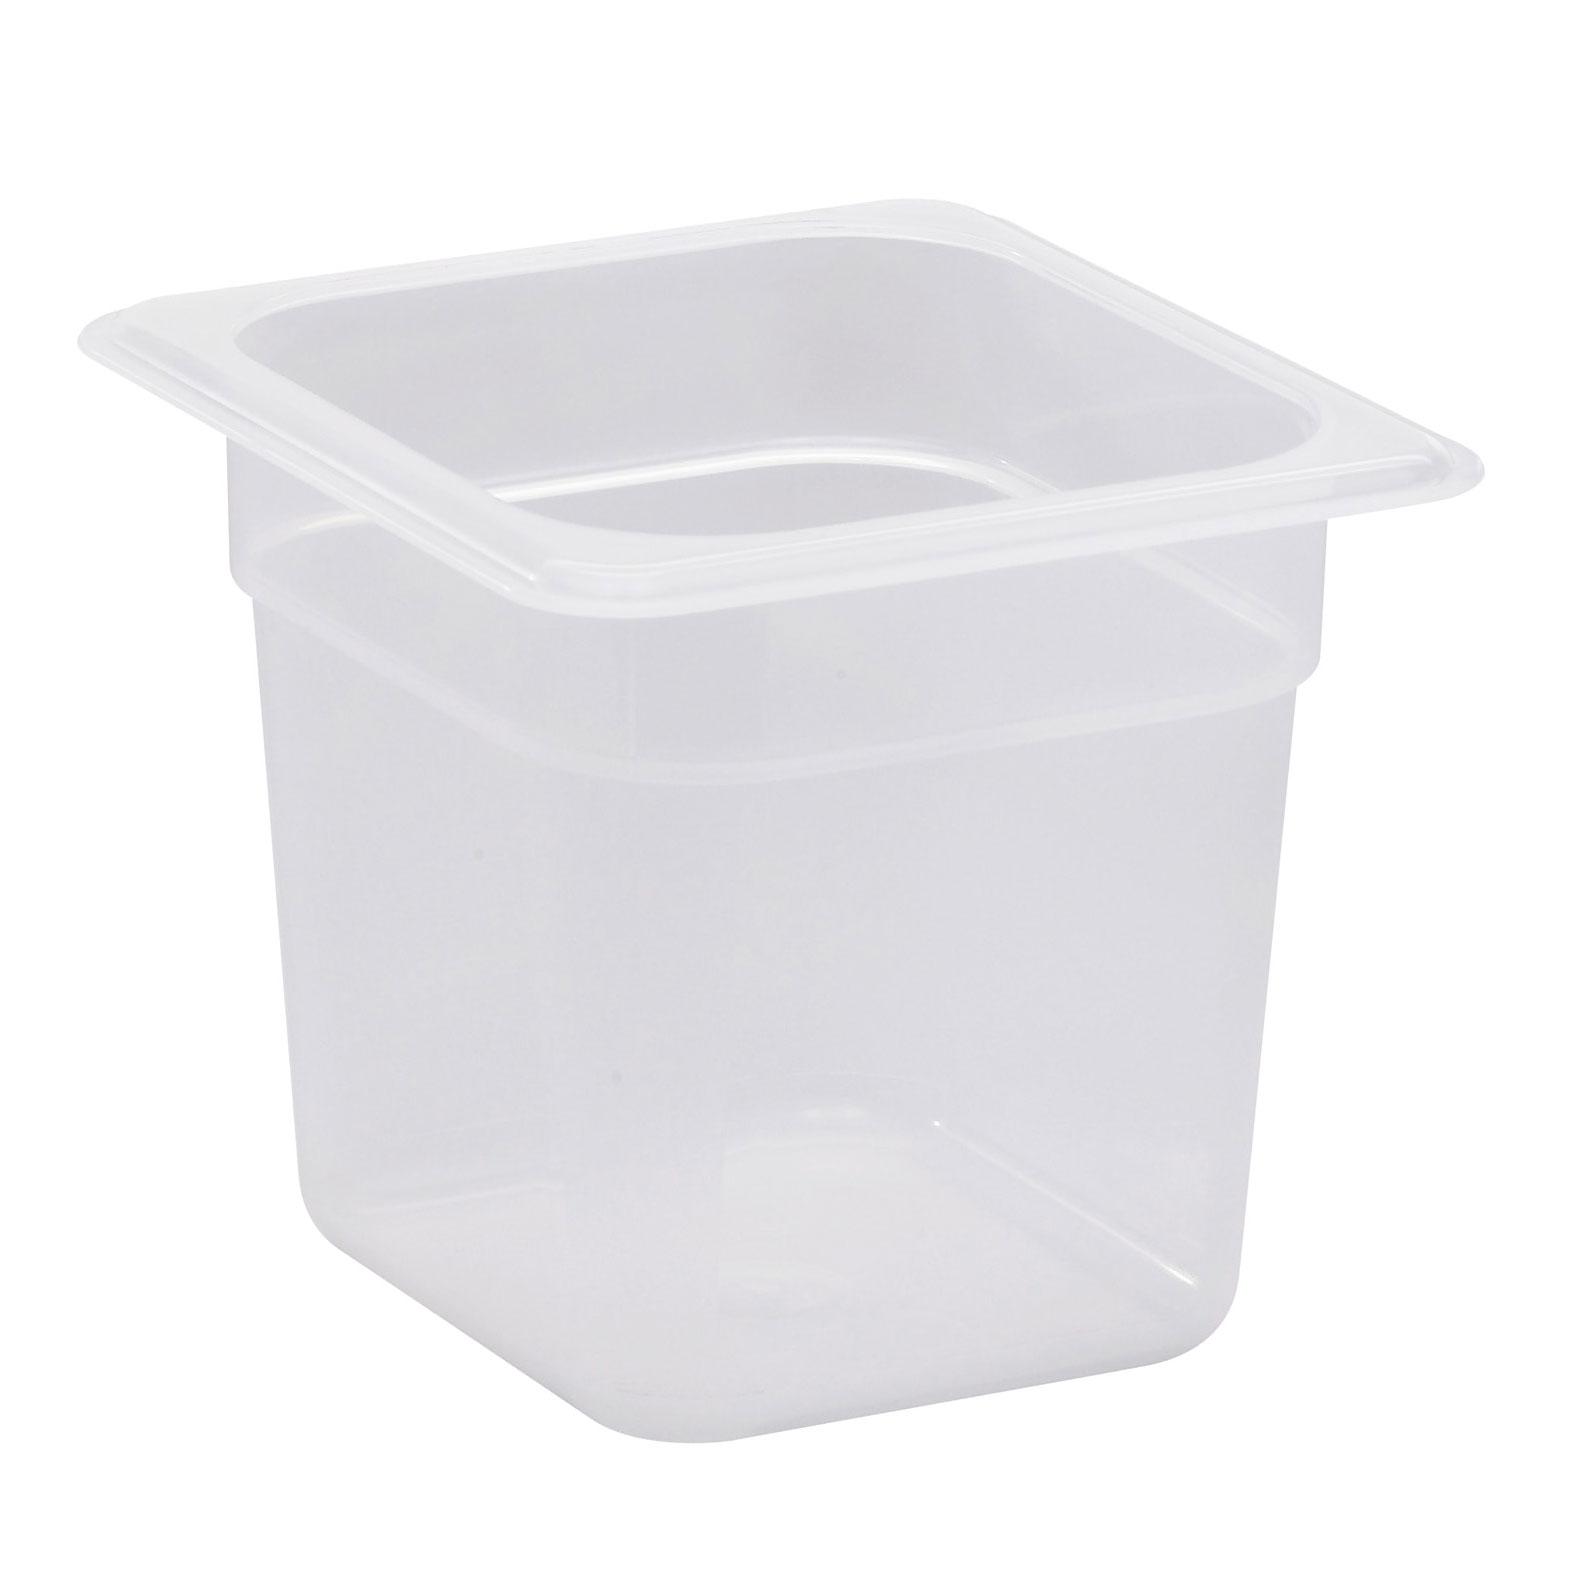 Cambro 66PP190 food/beverage storage container